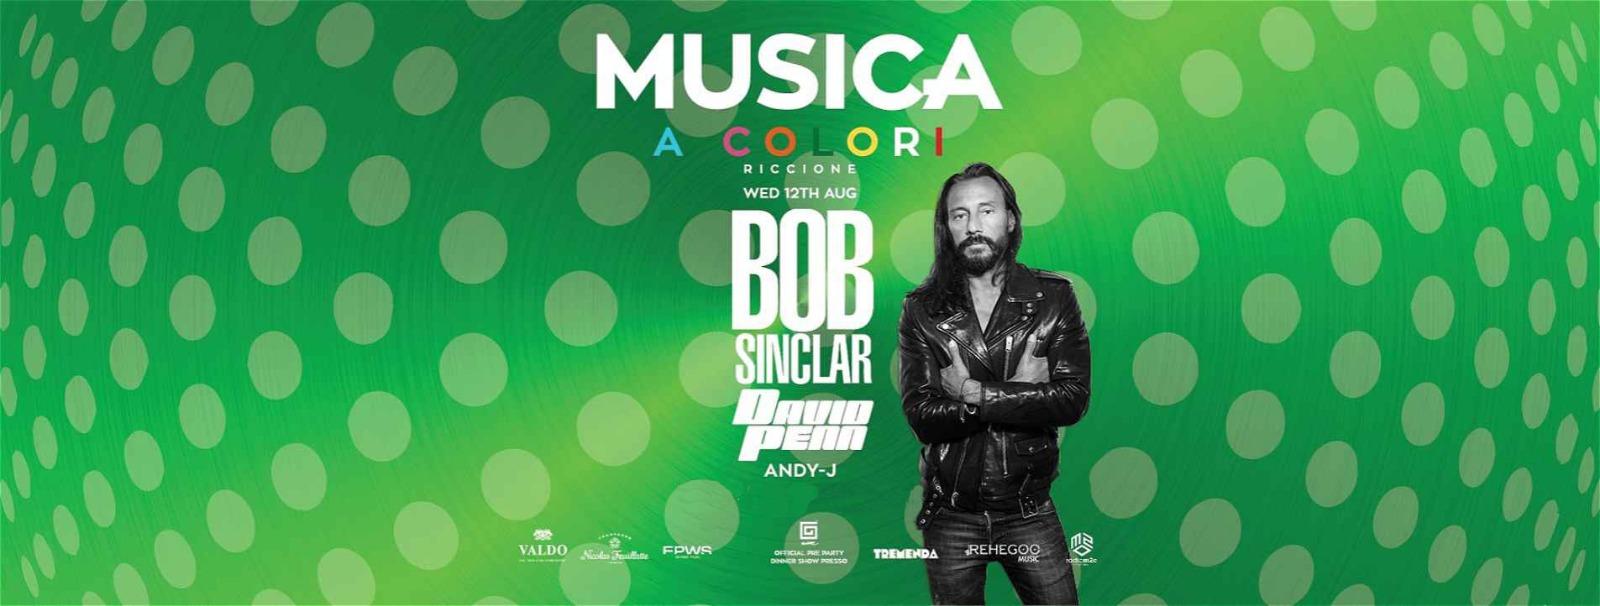 bob sinclair musica mercoledì 12 agosto